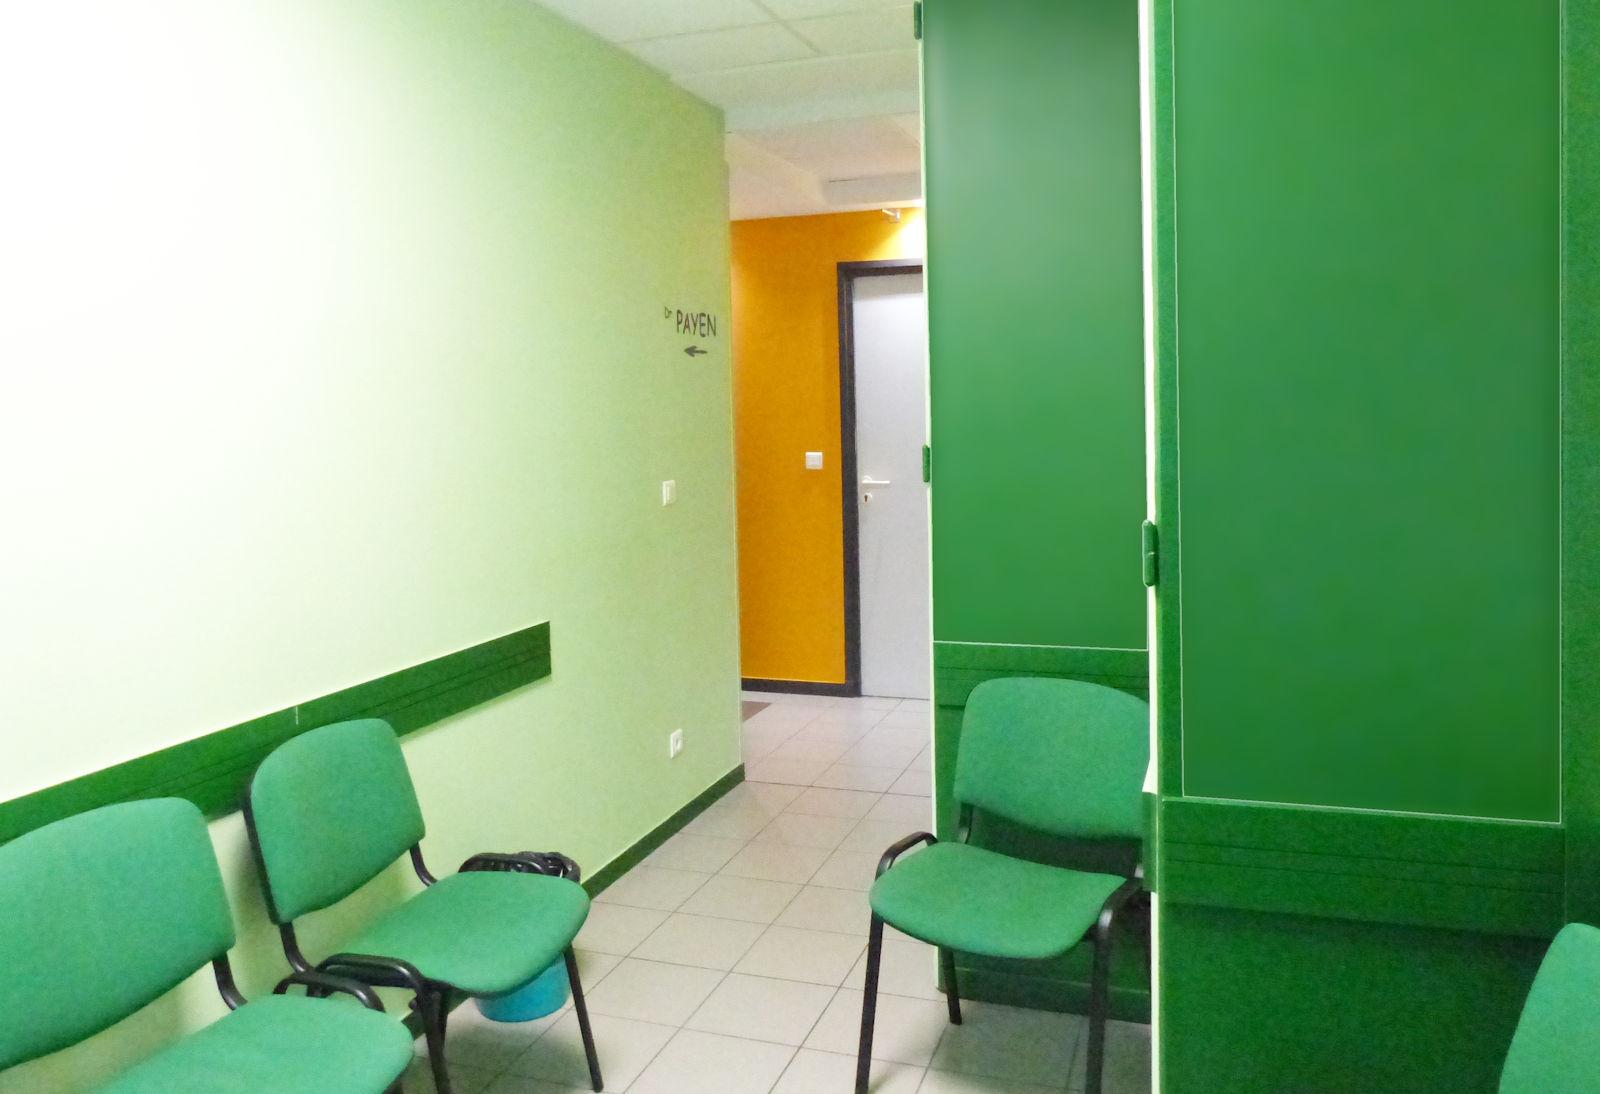 Docteur Payen, Ophtalmologue Tourcoing - Salle d'attente